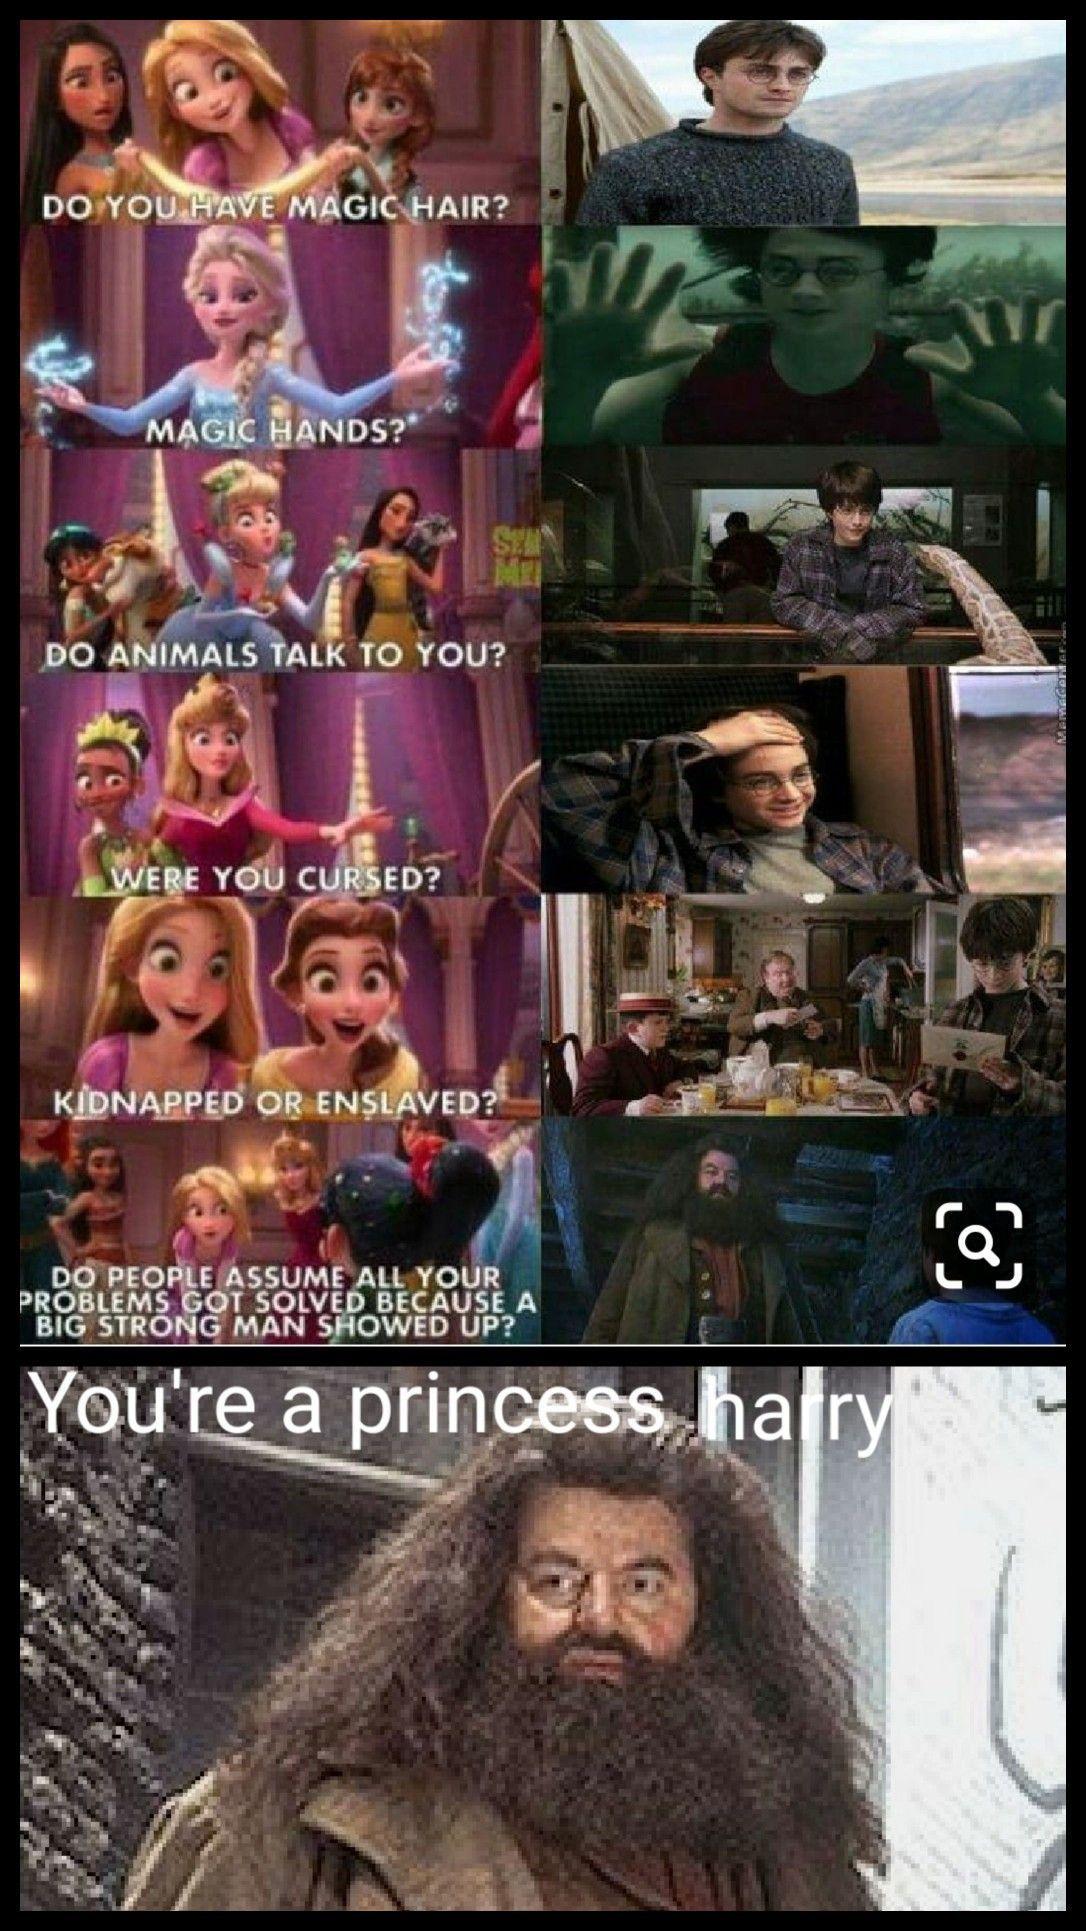 Wow Harry Potter Memes Realized This Only Yesterday Lol Harry Potter Fanlari Harry Potter Capsleri Komik Seyler